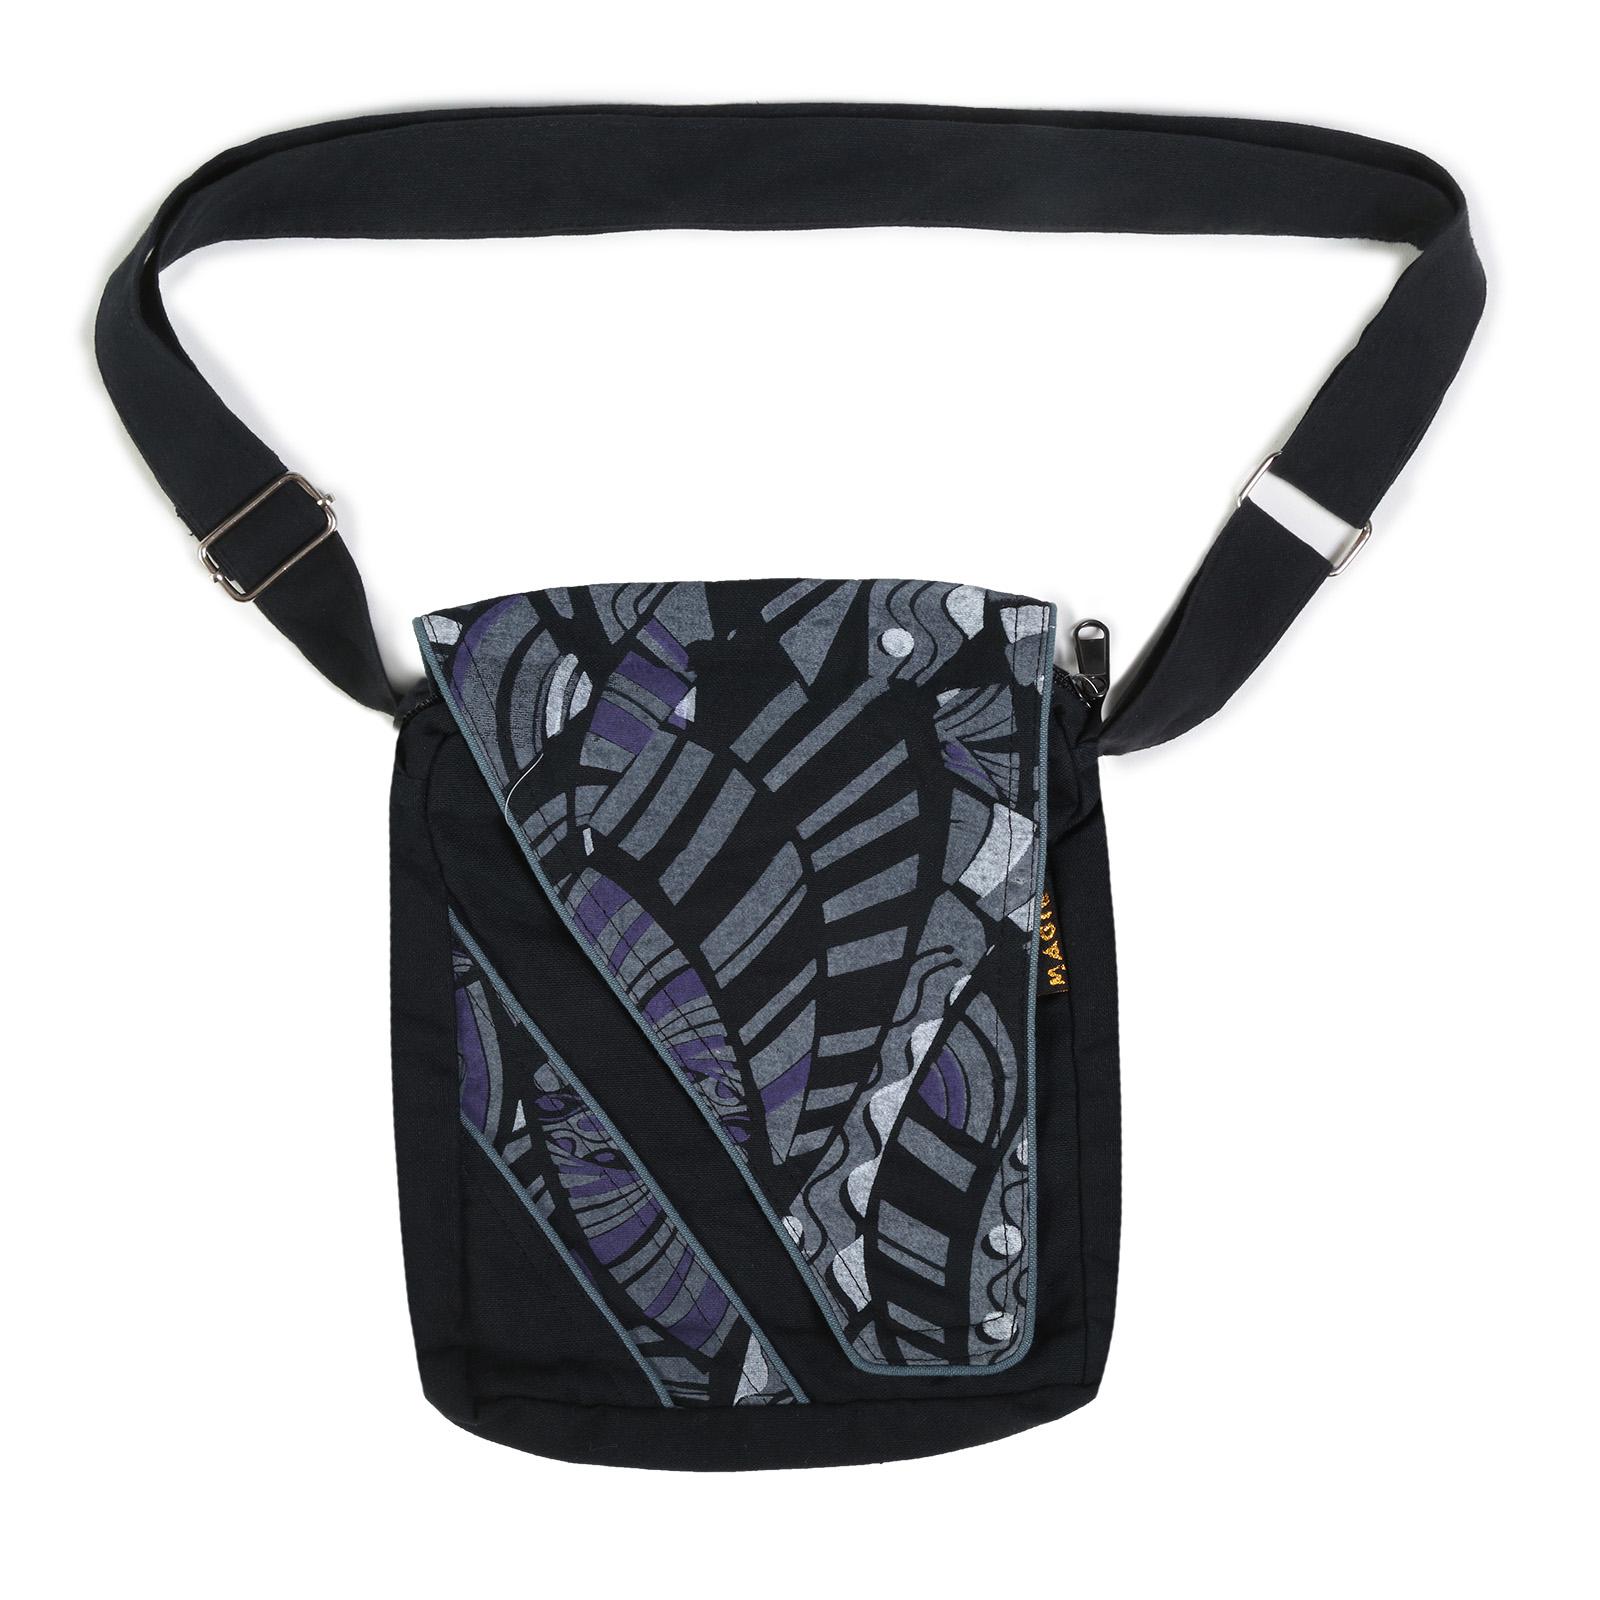 Alternative Damenhandtasche / Schultertasche Goa Psy 70er Retro Design